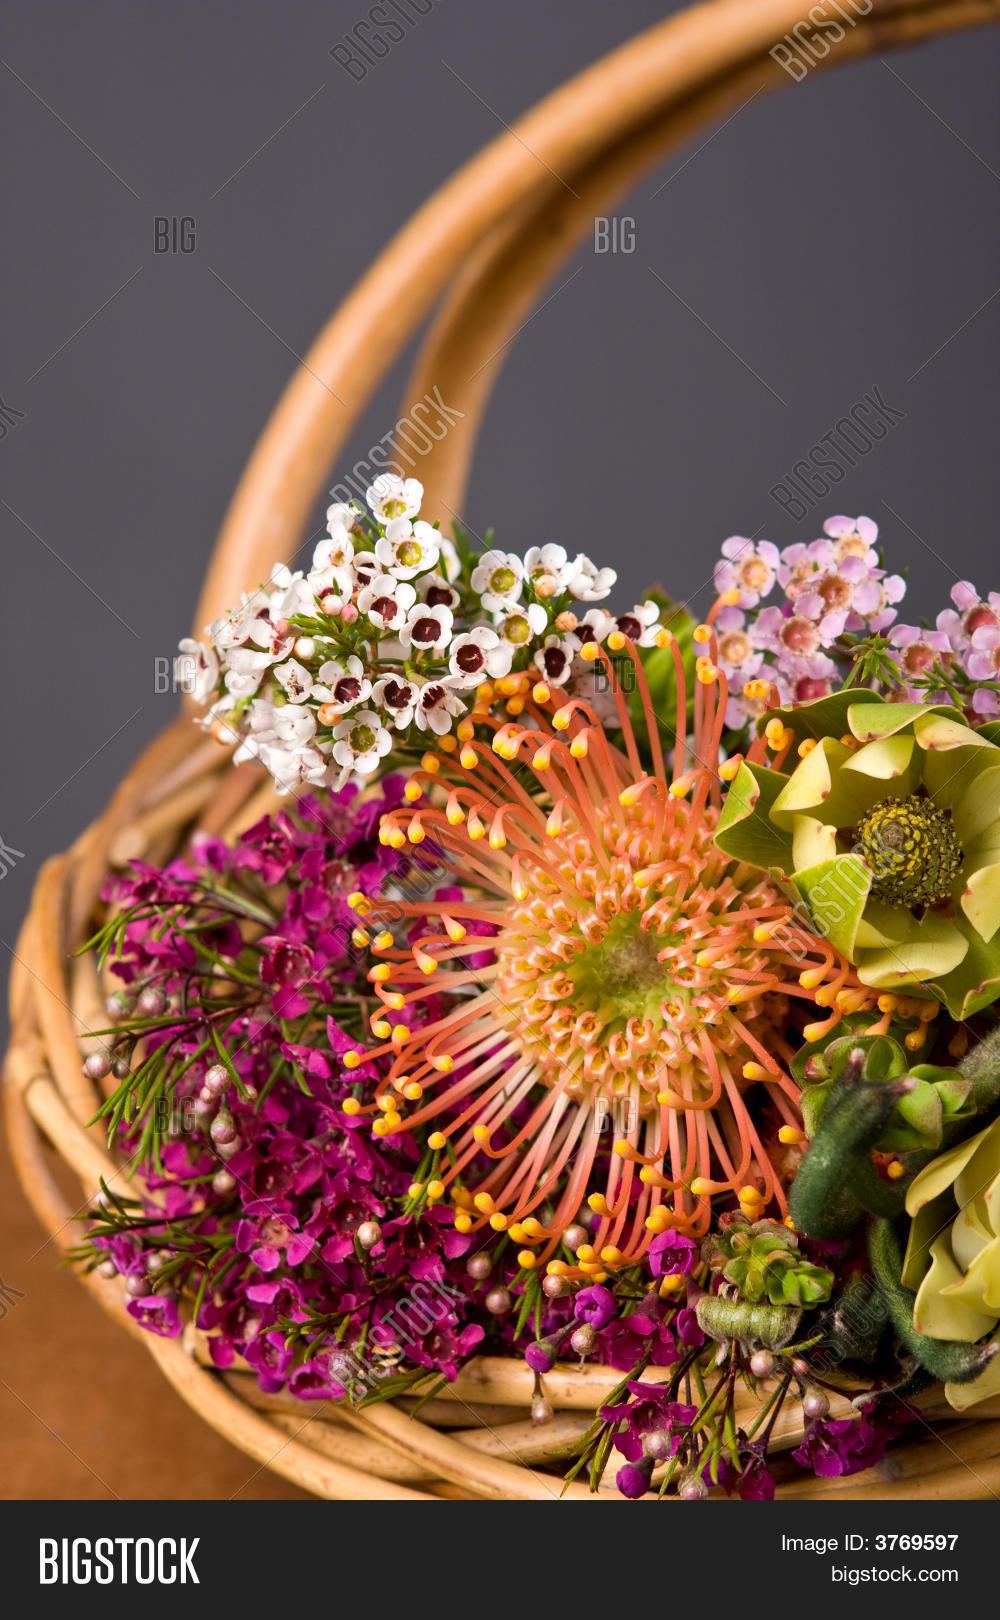 Australian native image photo free trial bigstock australian native flower bouquet izmirmasajfo